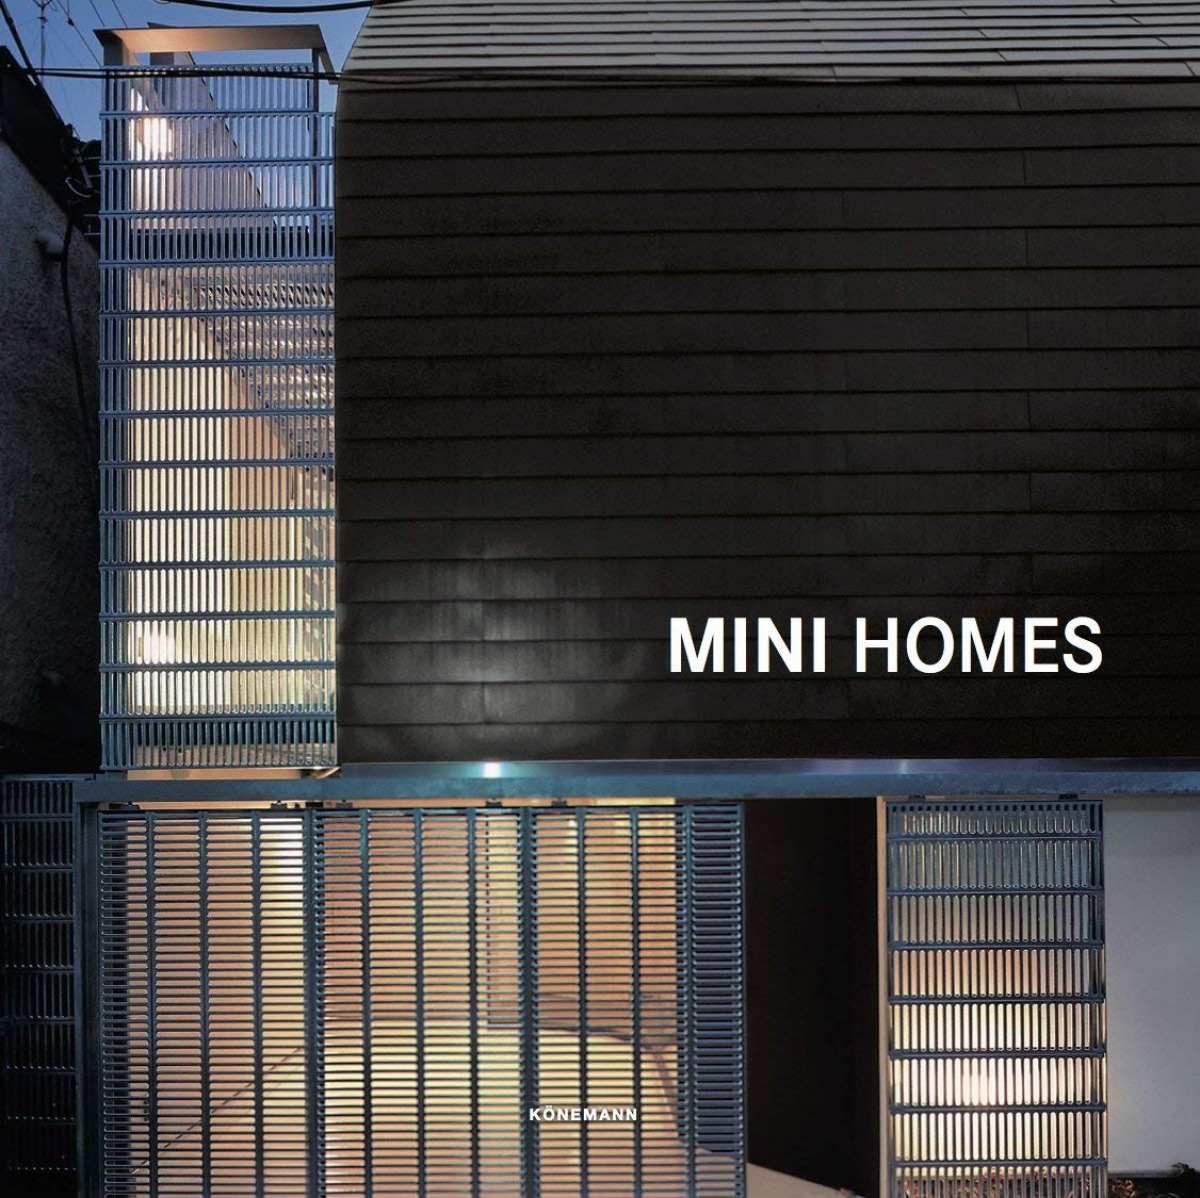 MINI HOMES 9783741920509